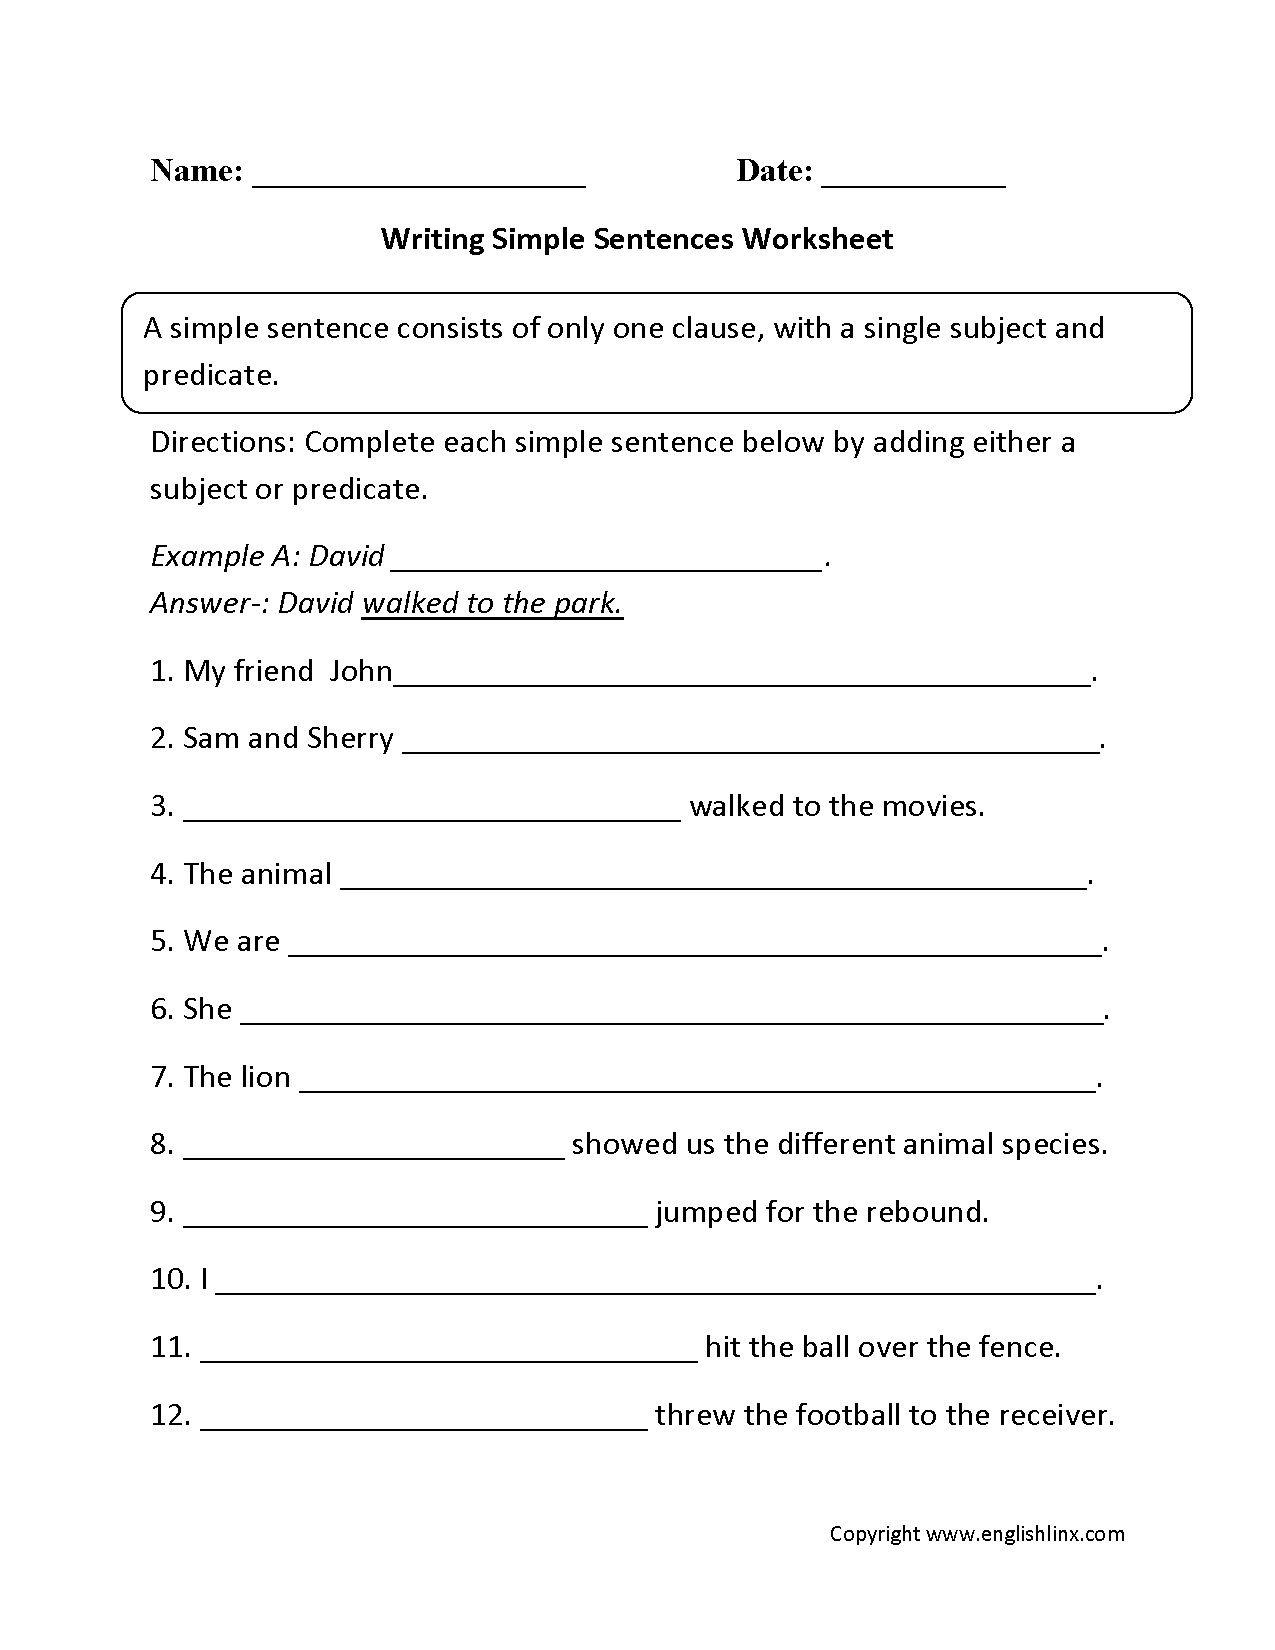 Free Printable Sentence Writing Worksheets In